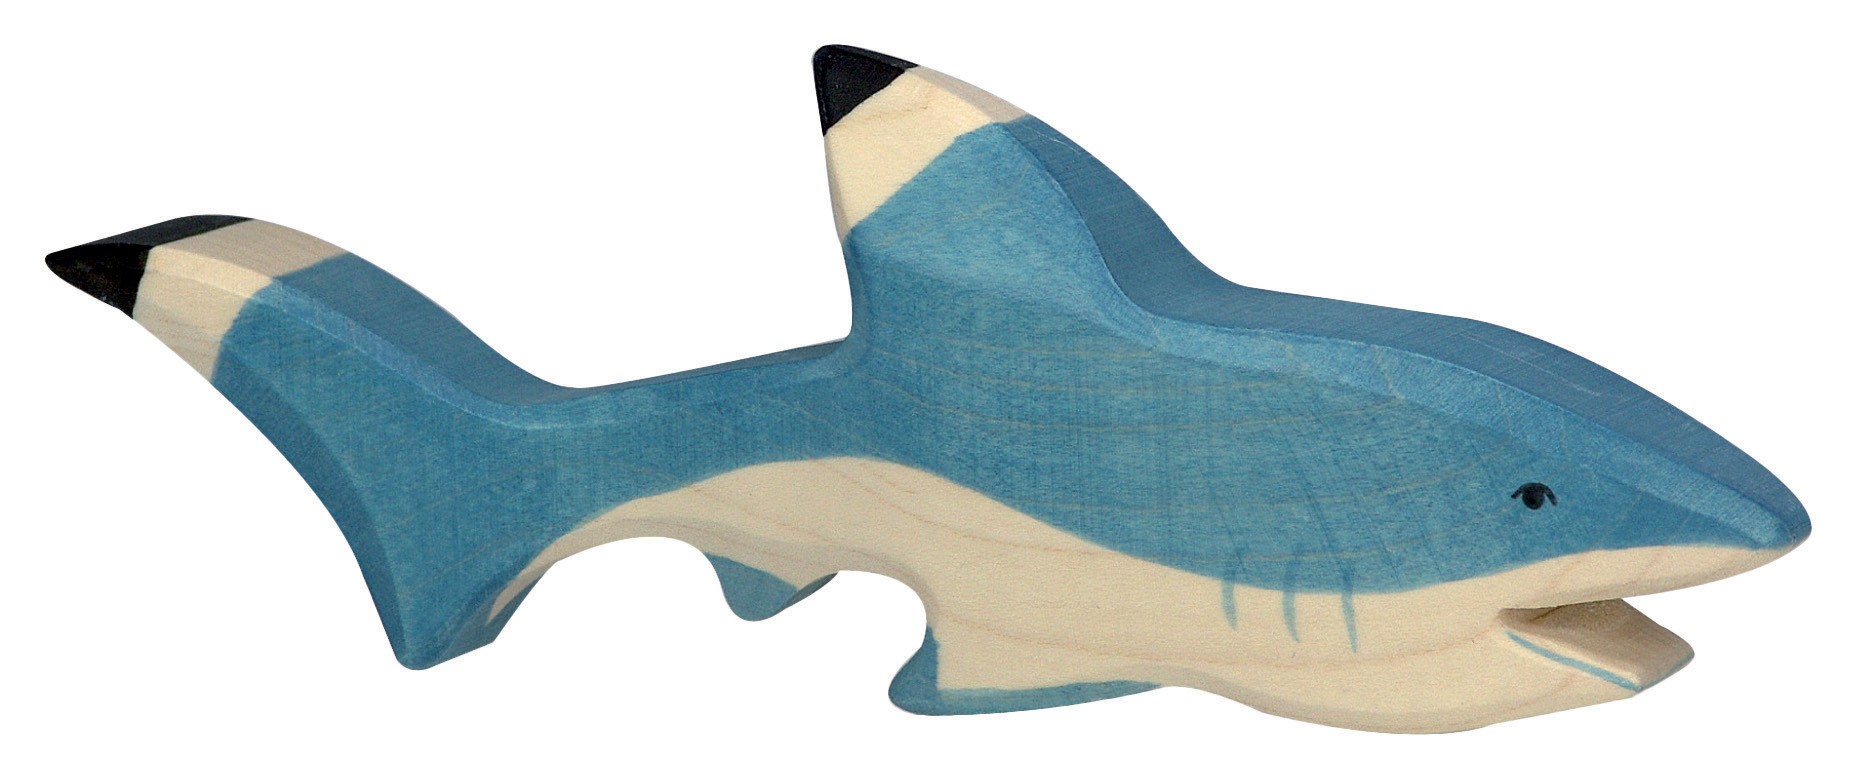 Shark Toys For Boys And Dinosaurs : Holztiger shark